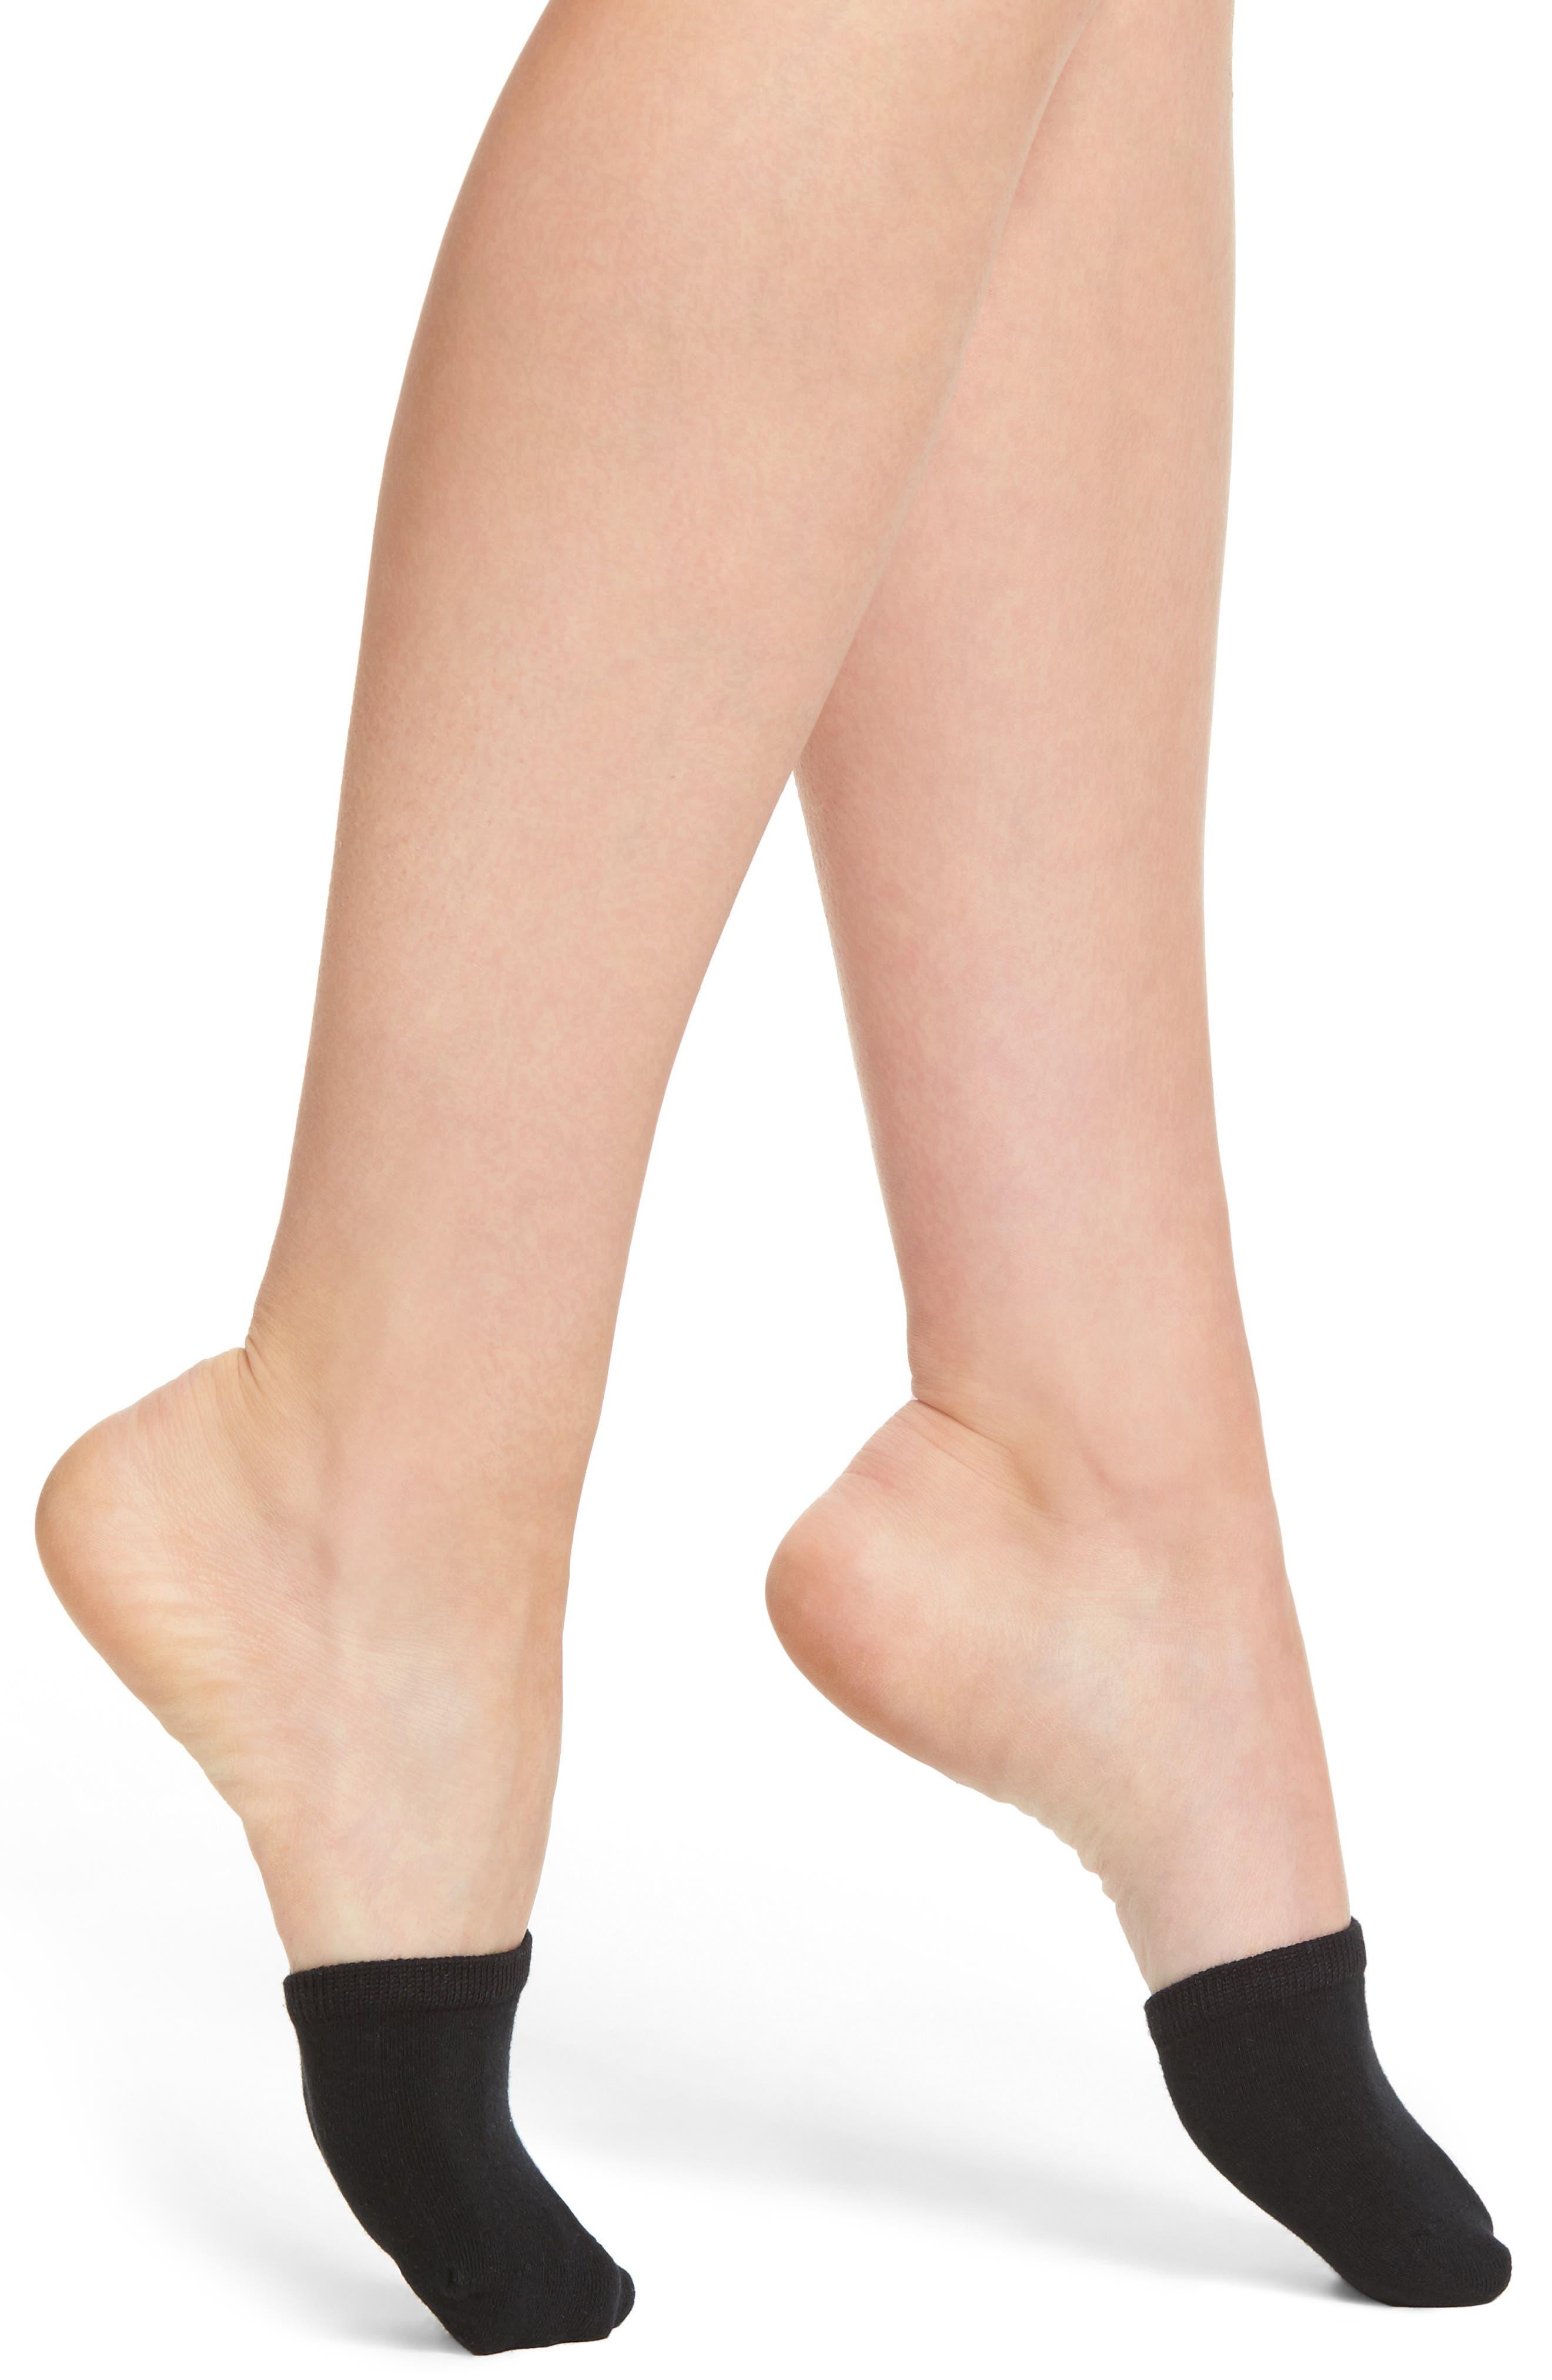 Main Image - SOCKART 2-Pack Mule Socks